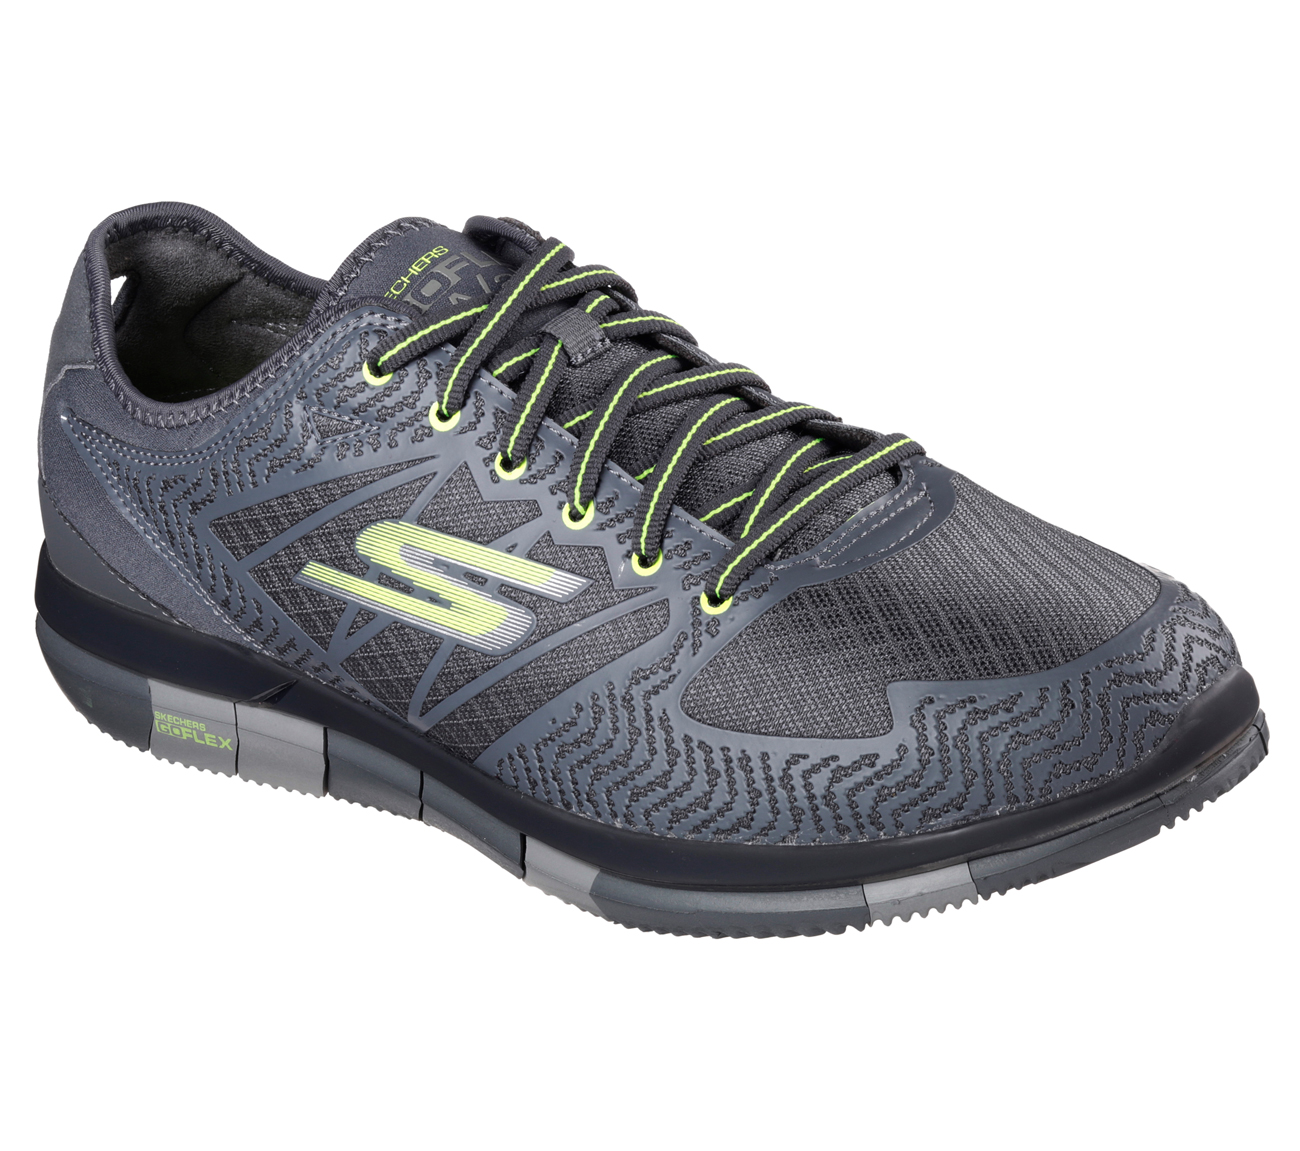 buy skechers skechers go flex walk aviator skechers performance shoes only. Black Bedroom Furniture Sets. Home Design Ideas